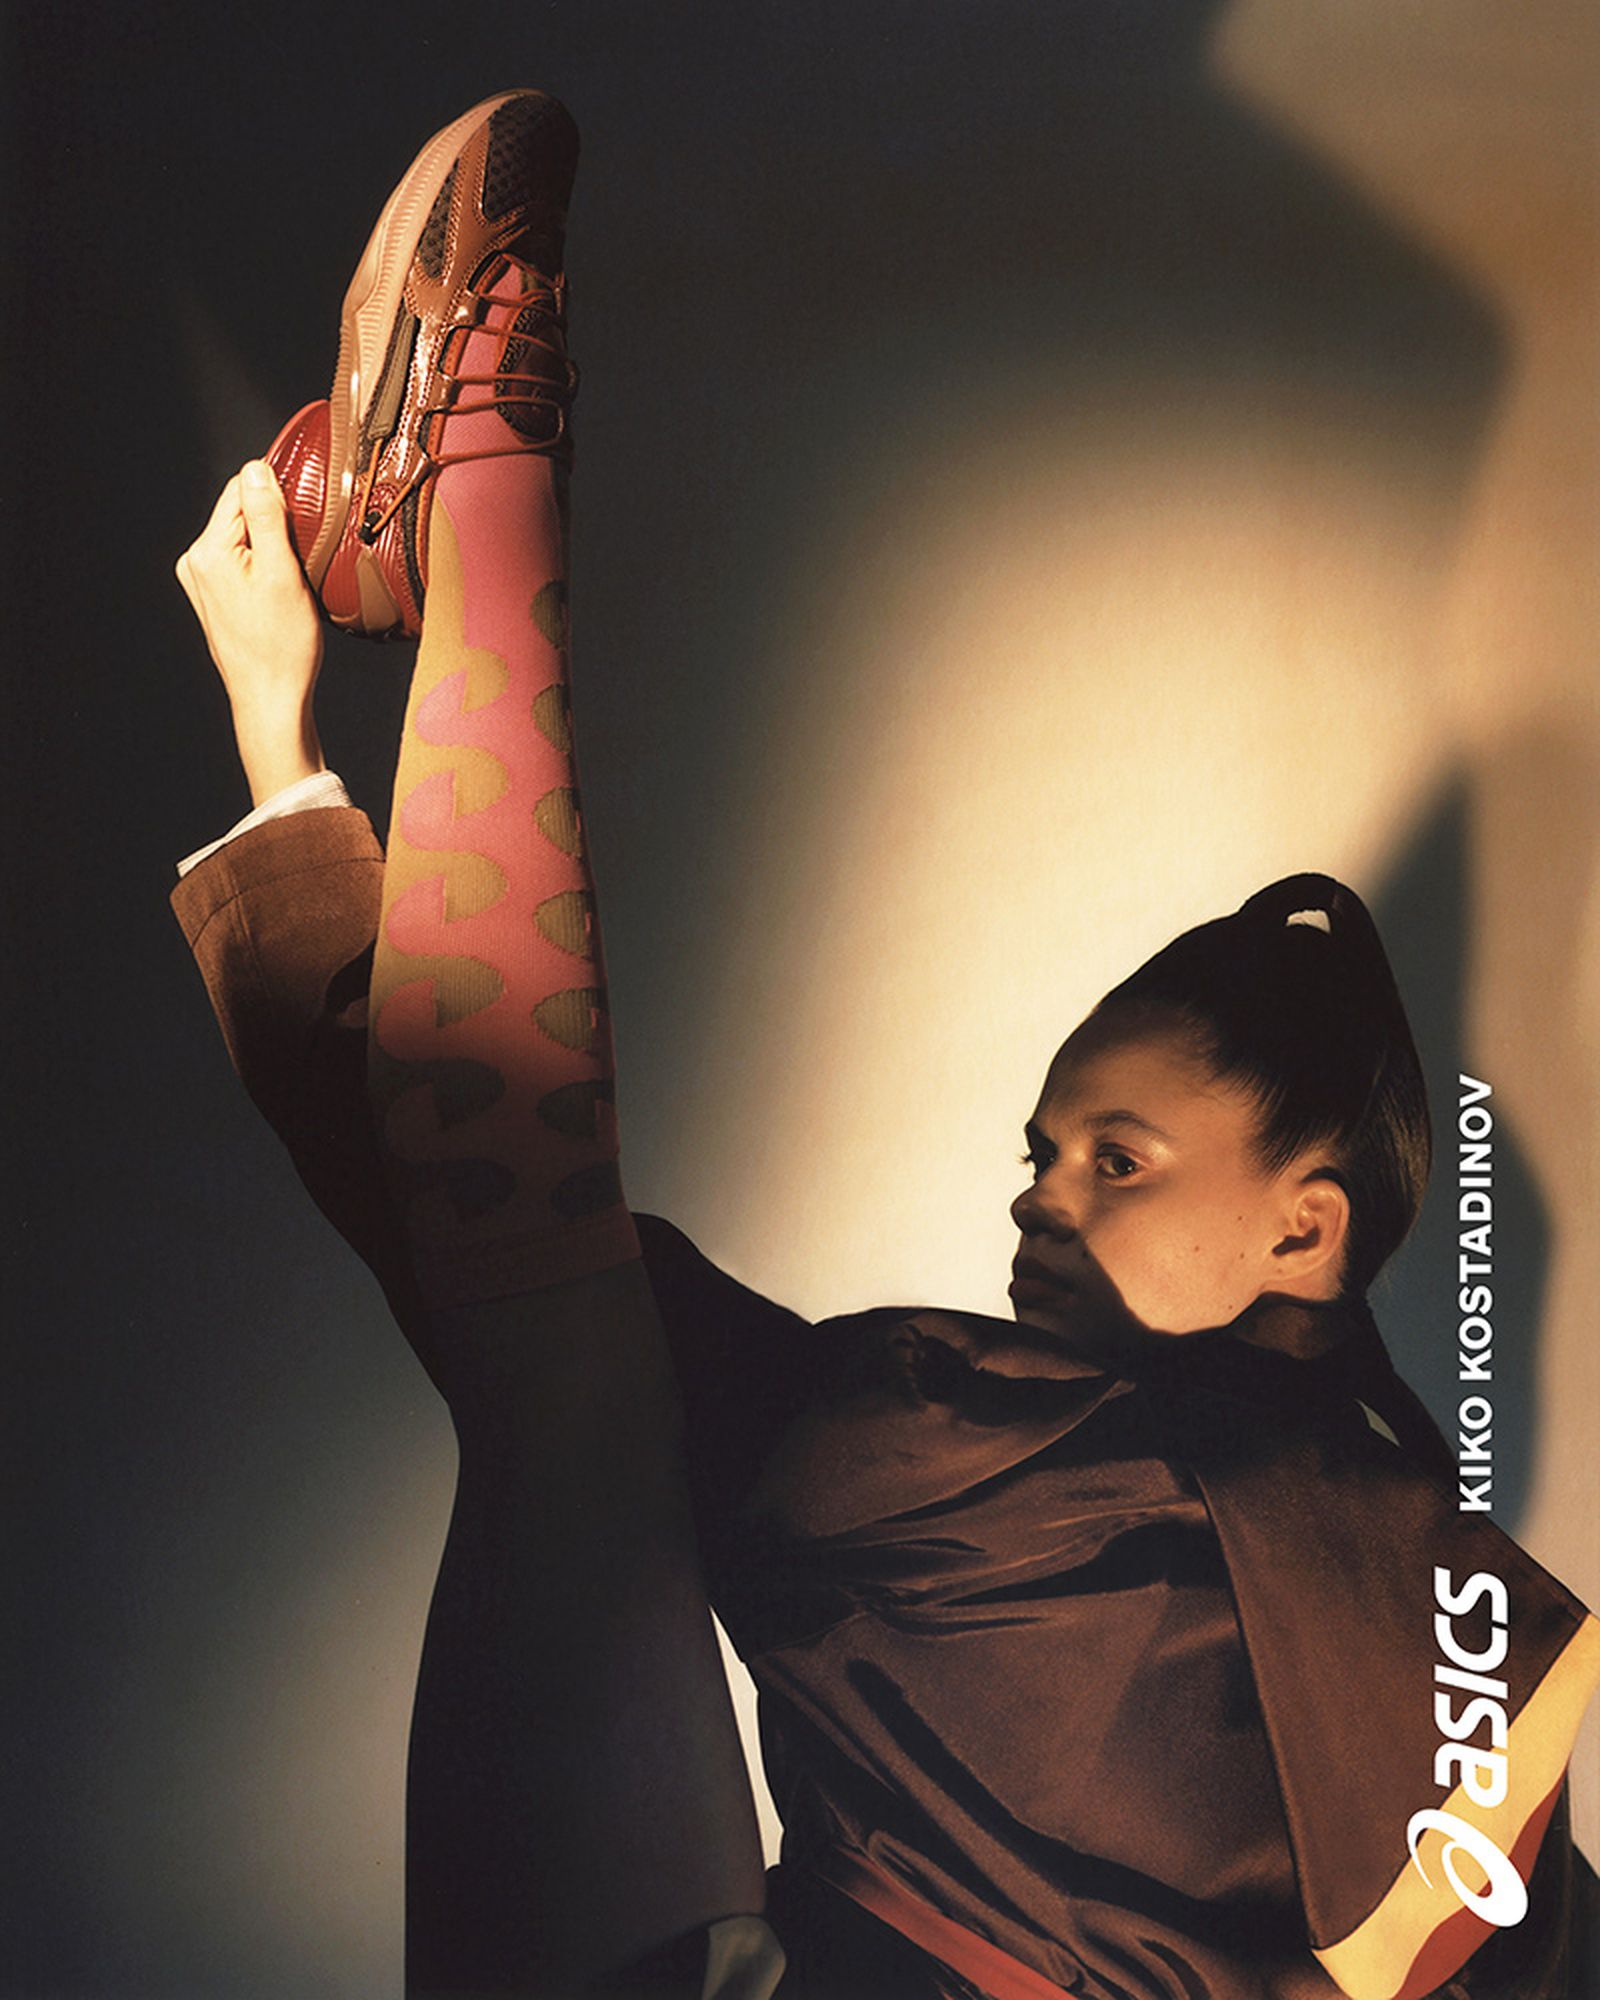 kiko-kostadinov-asics-gel-aurania-release-date-price-15